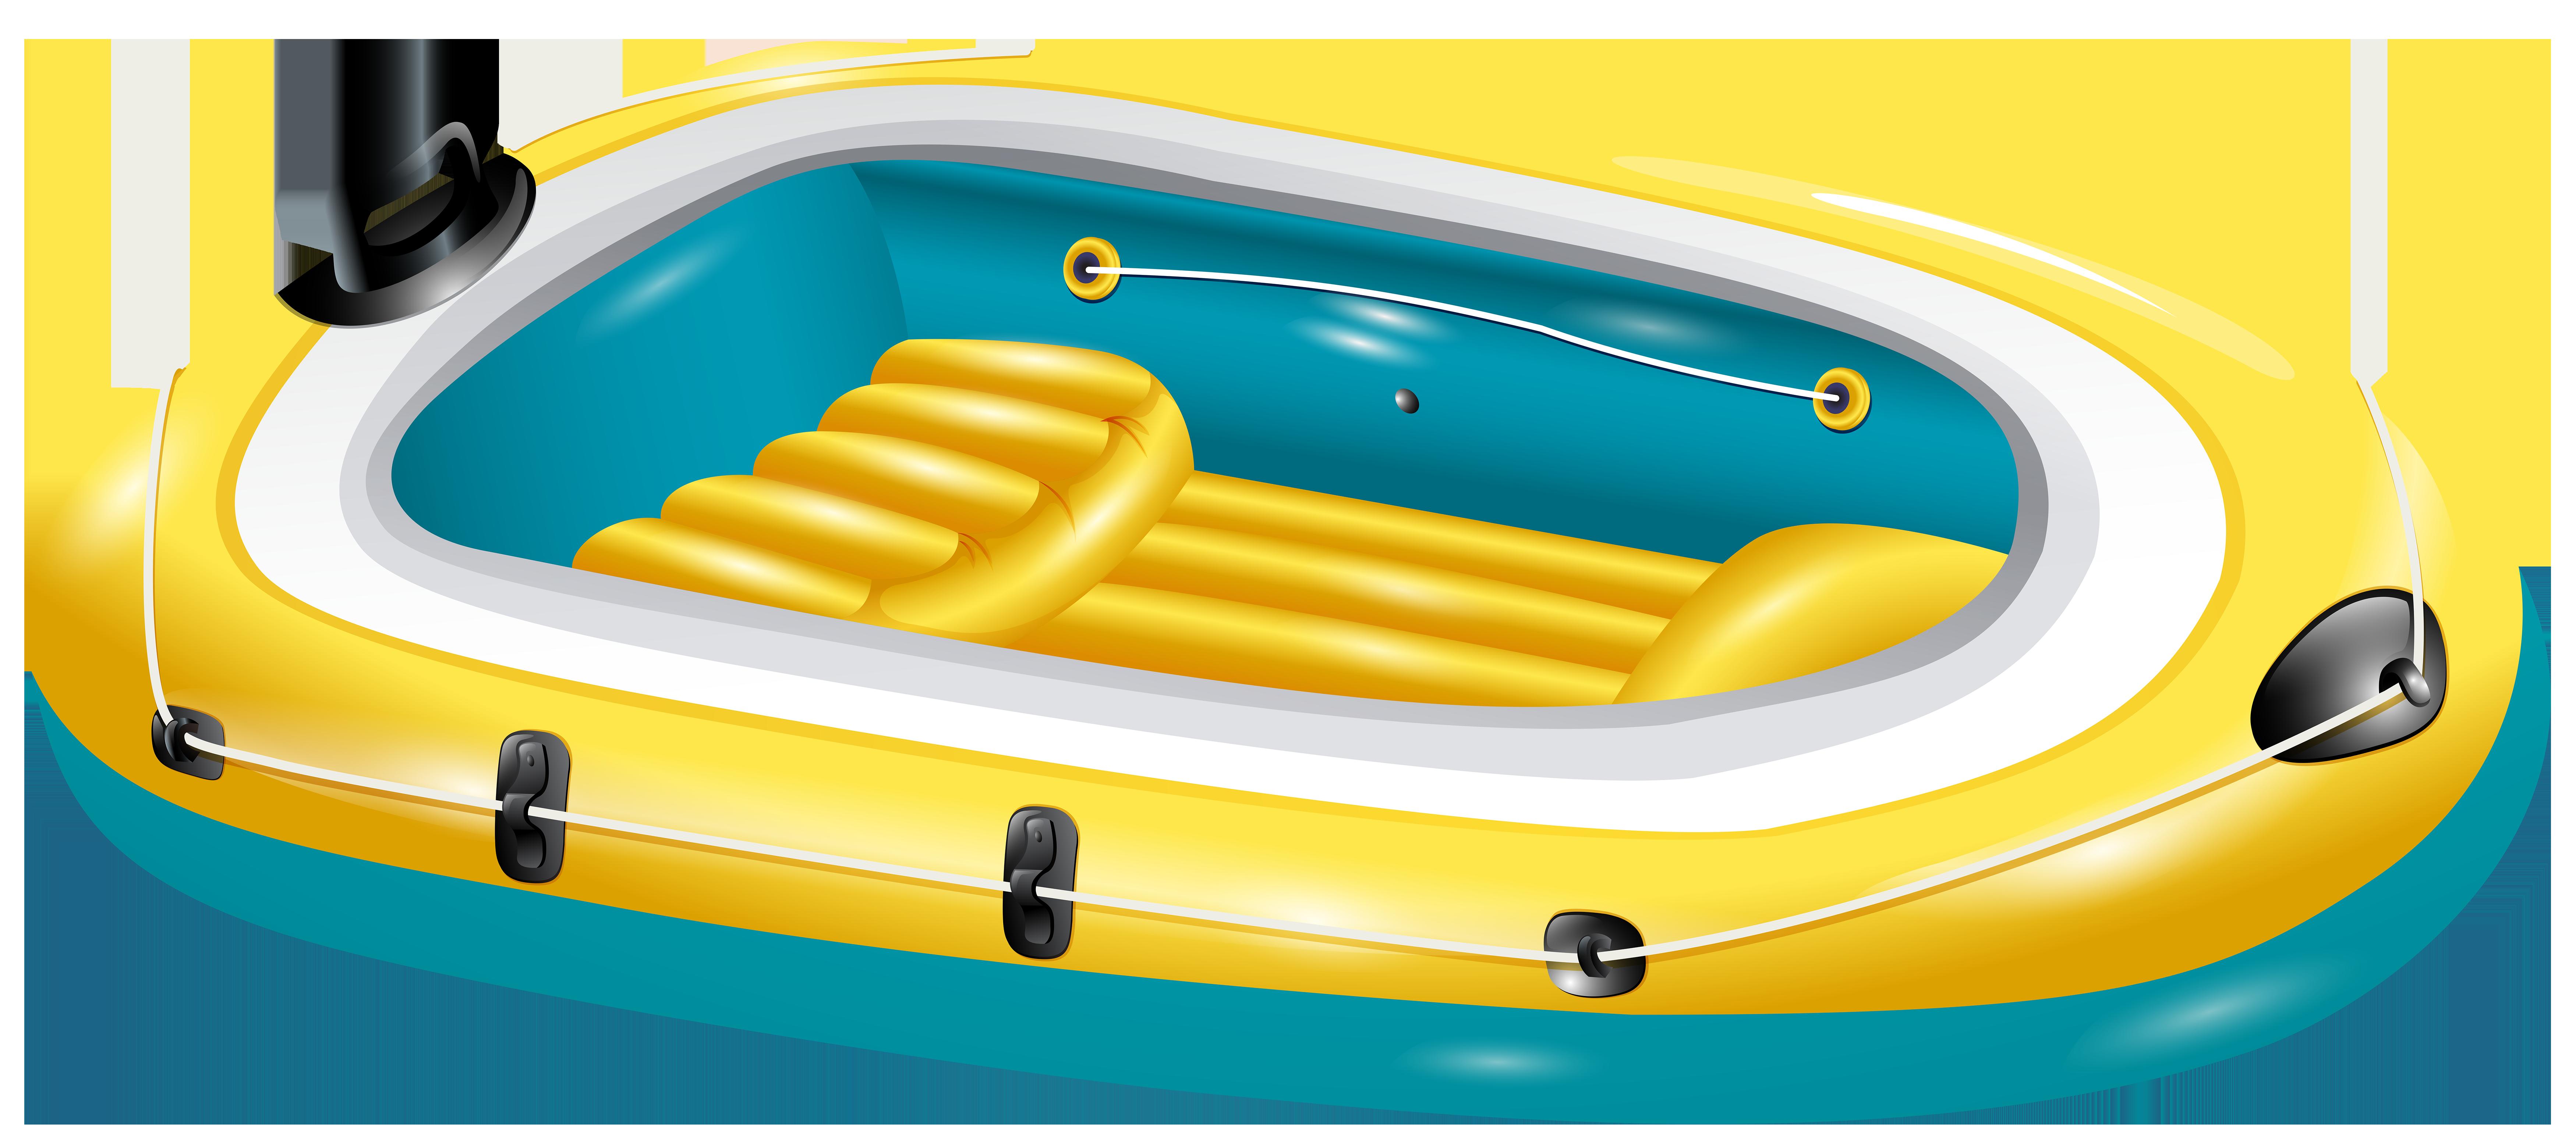 Boat transparent png clip. Boating clipart summer